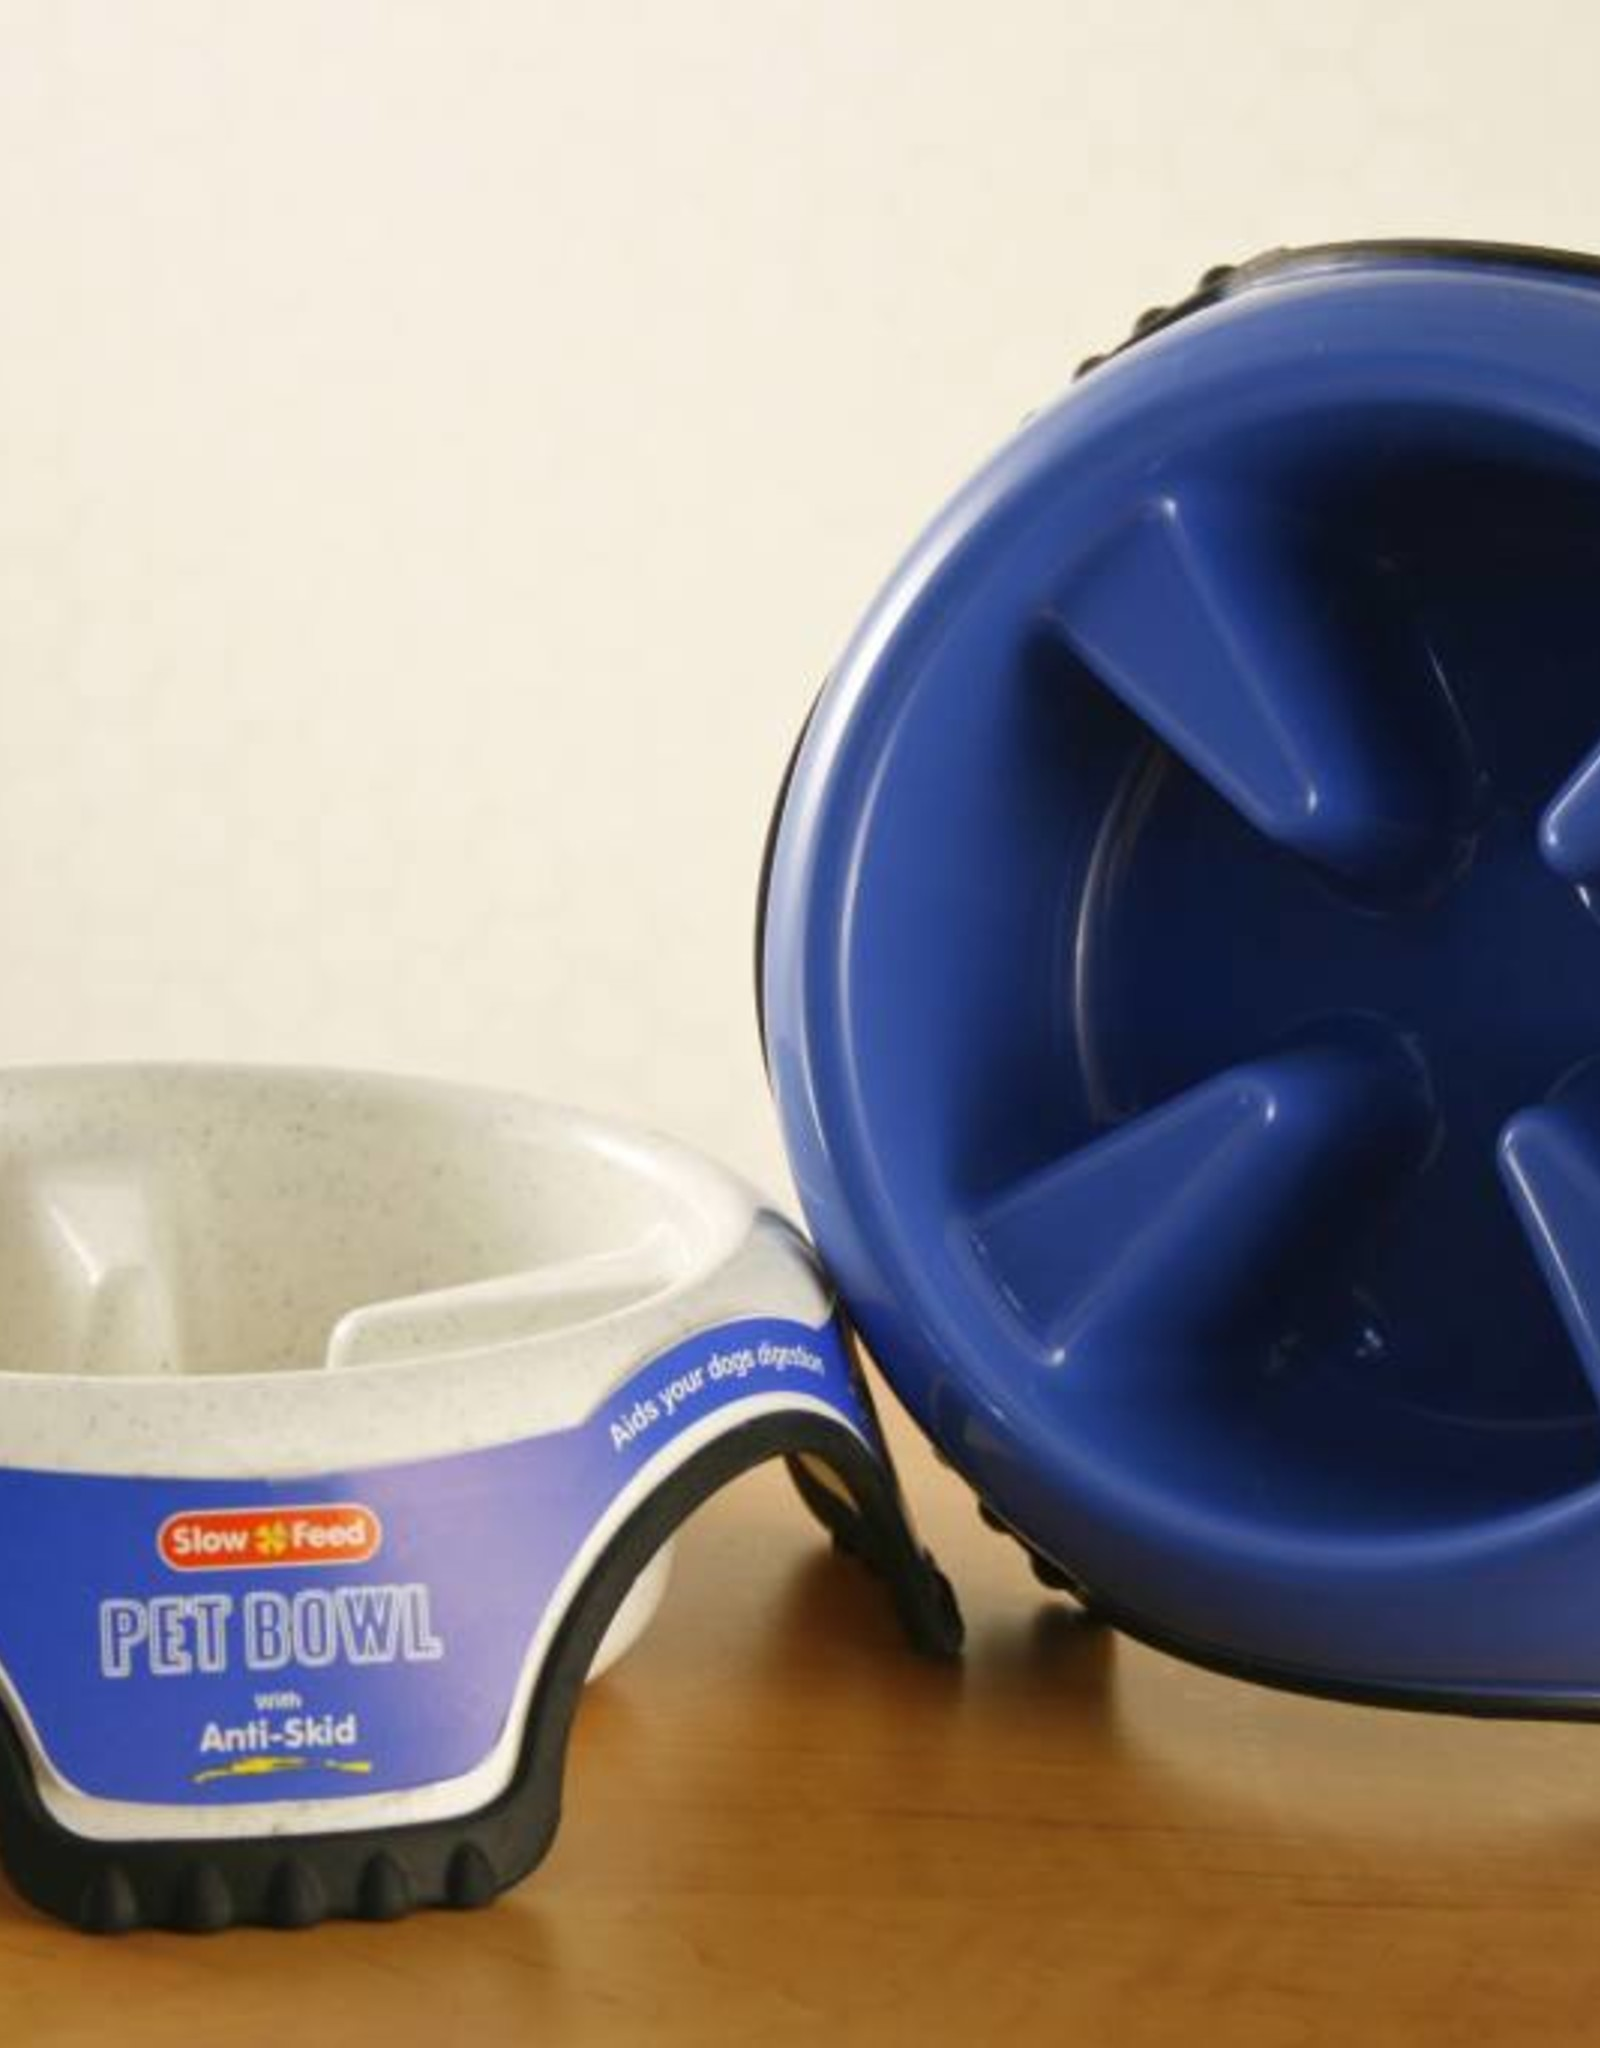 JW Anti-Skid Slow Feed Pet Bowl